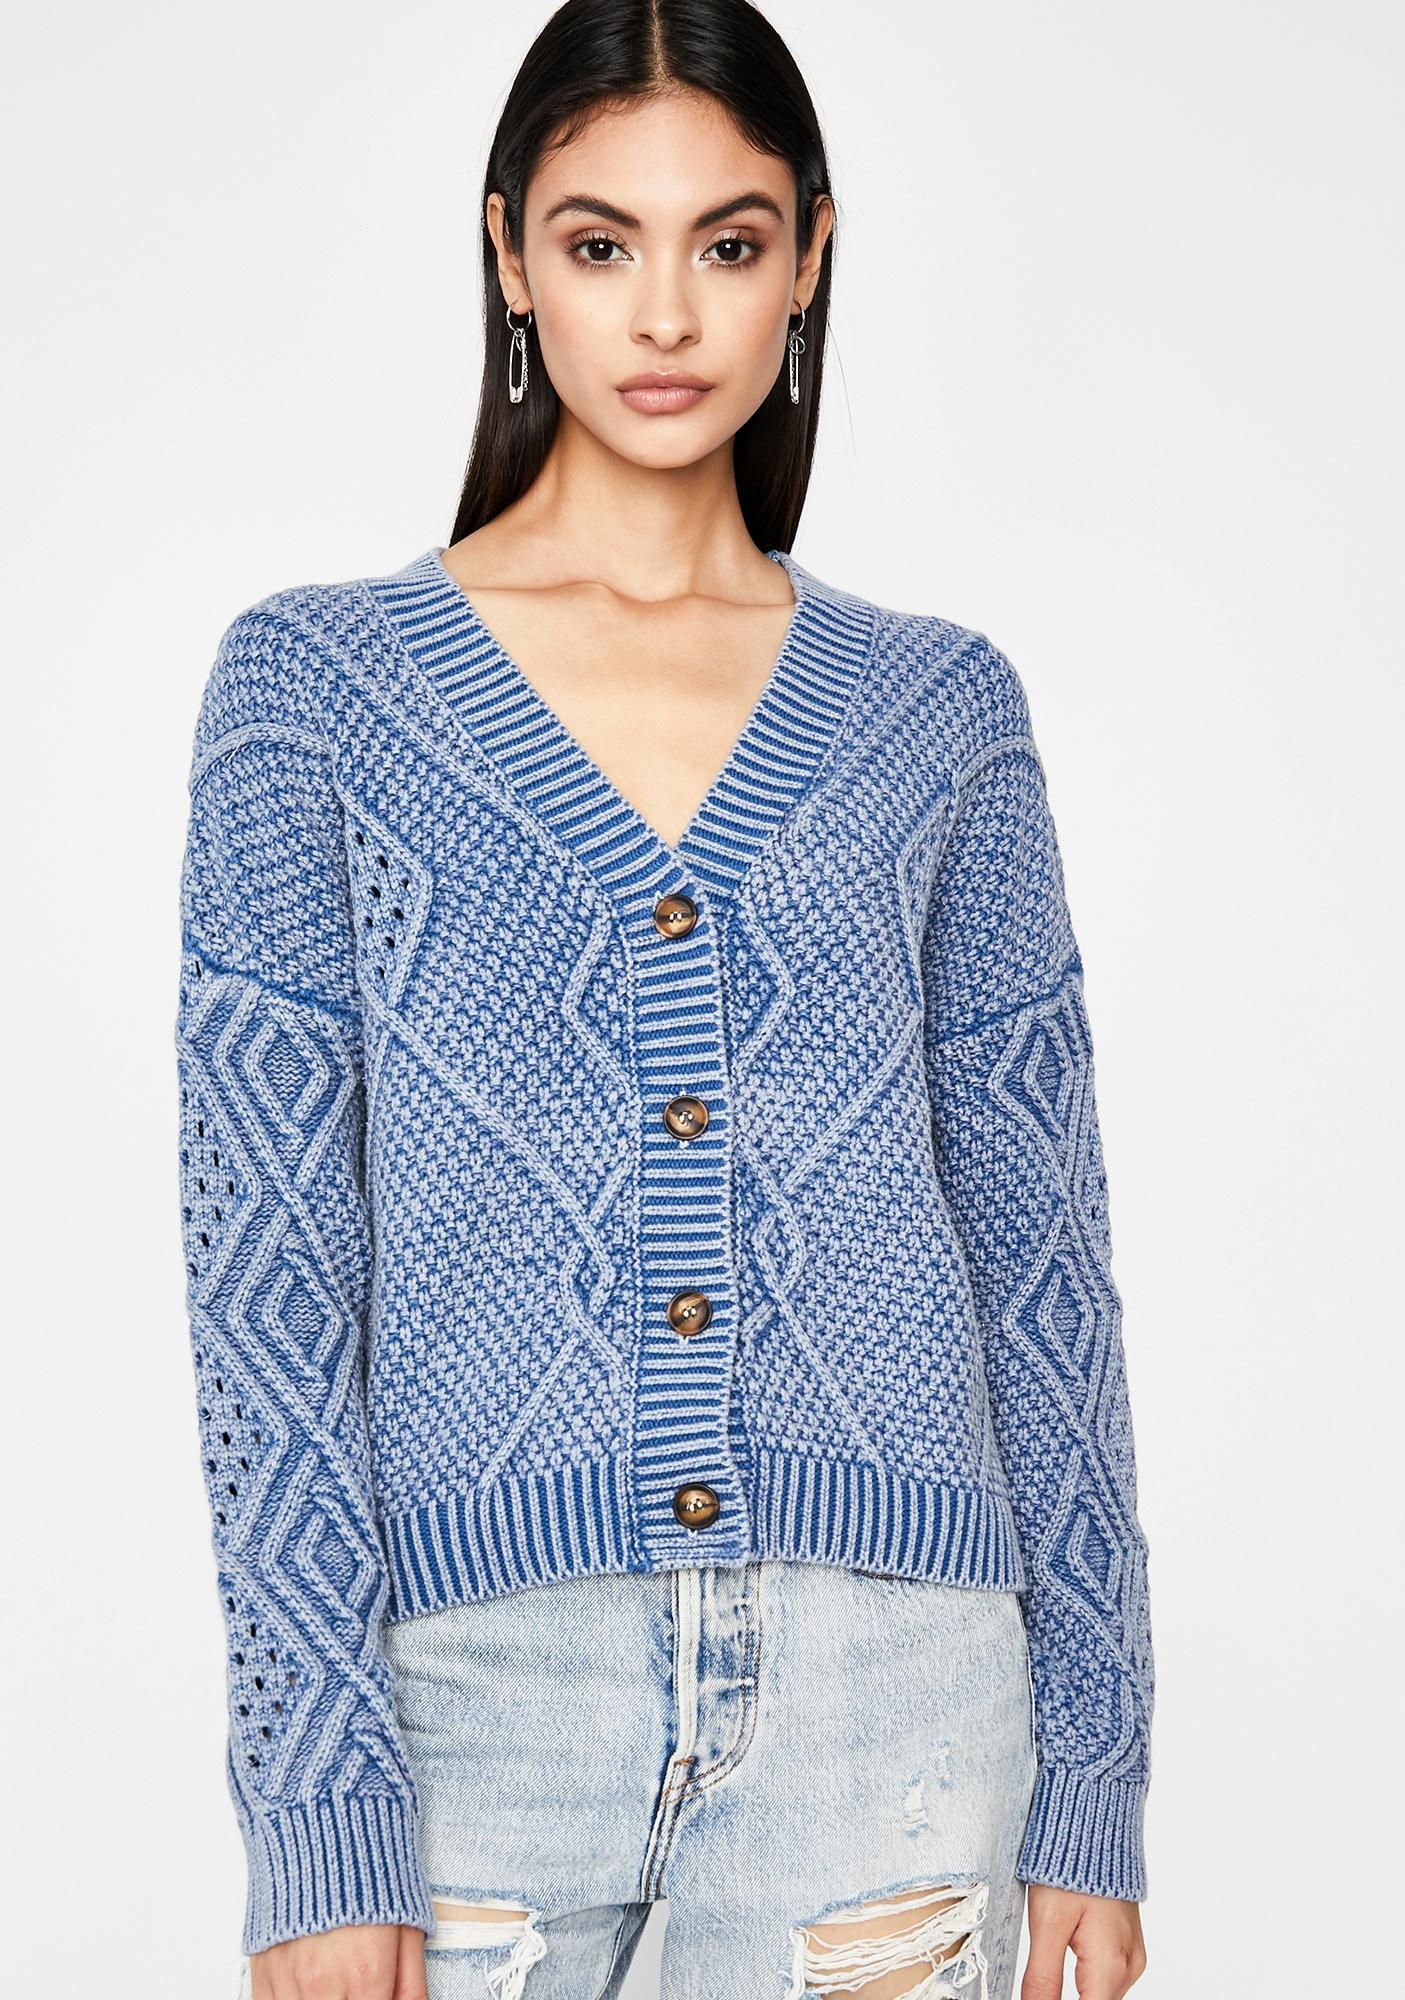 Itz A Beautiful Day Knit Cardigan